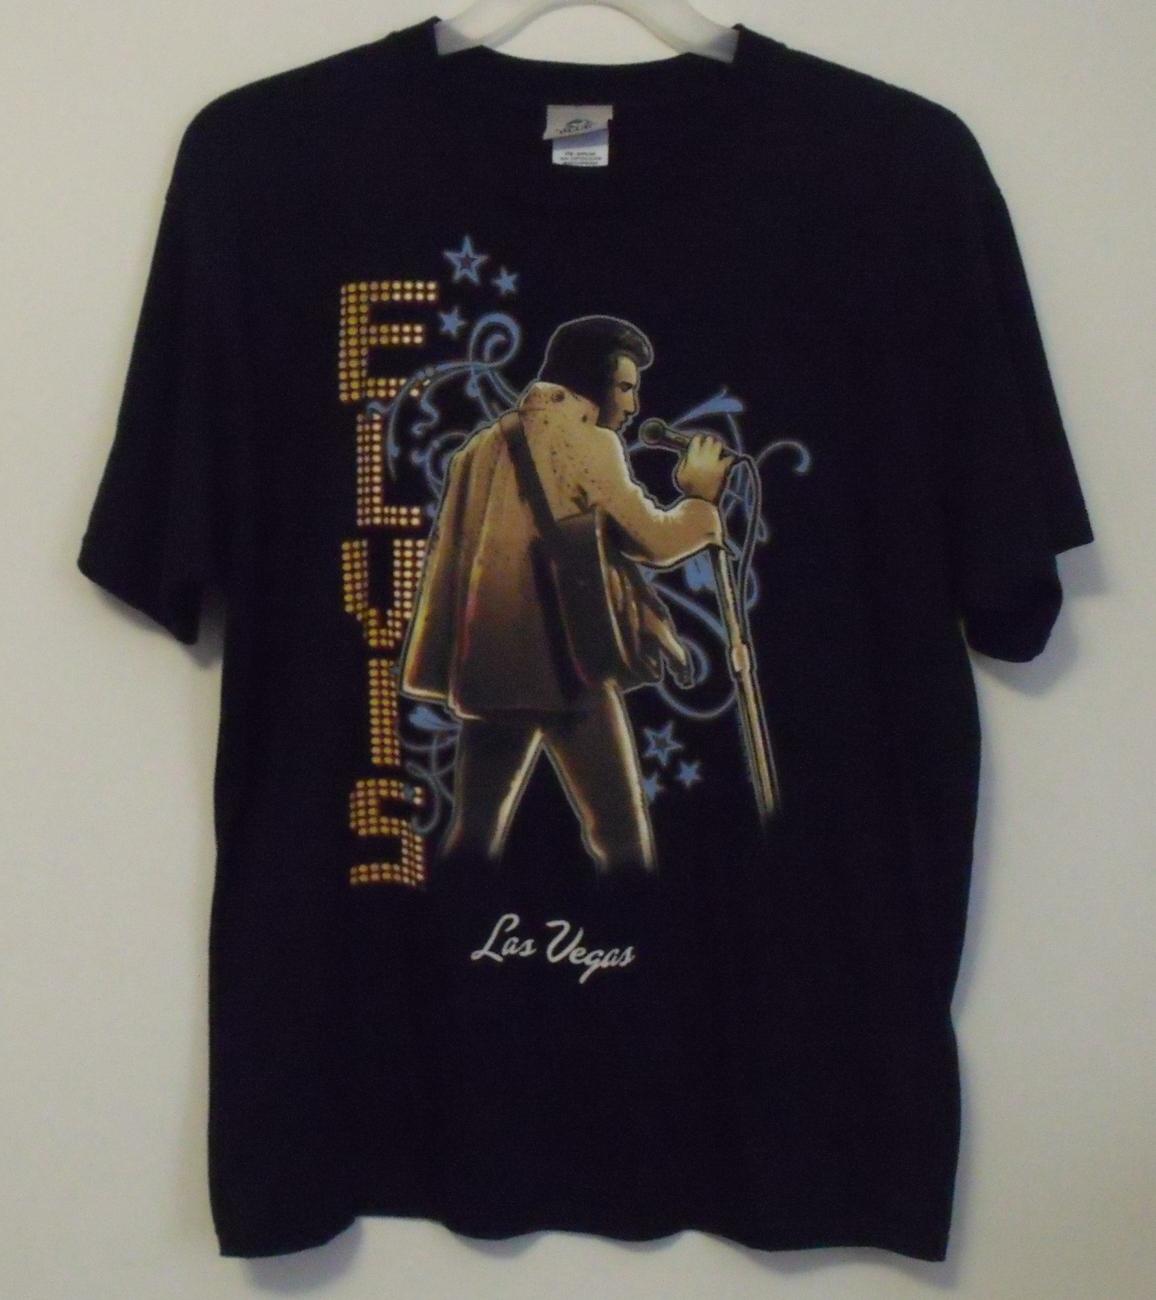 Elvis tshirt front